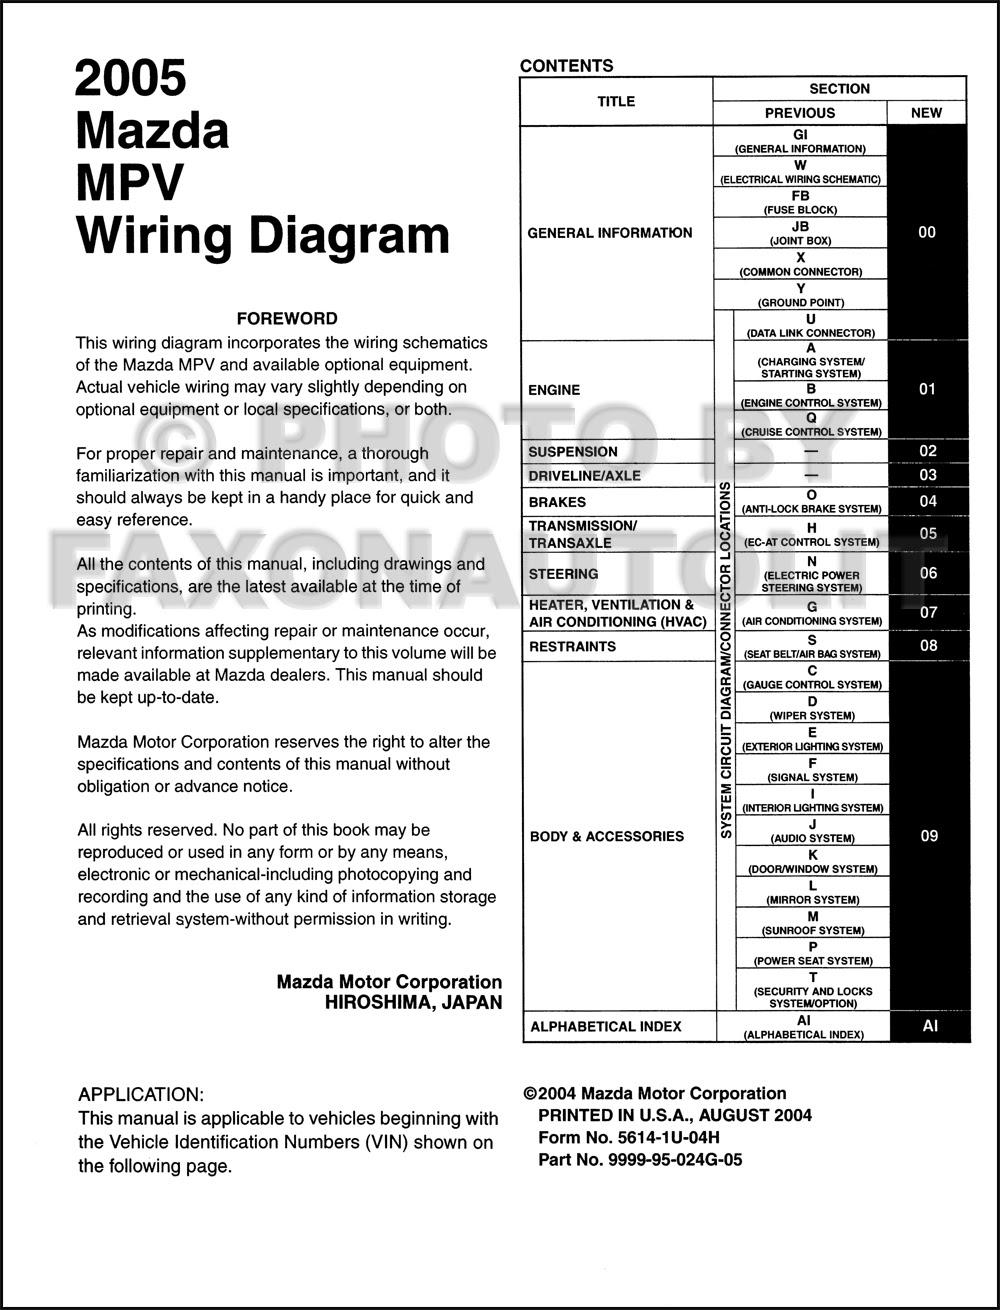 2004 Mazda Mpv Wiring Diagram - Wiring Diagram